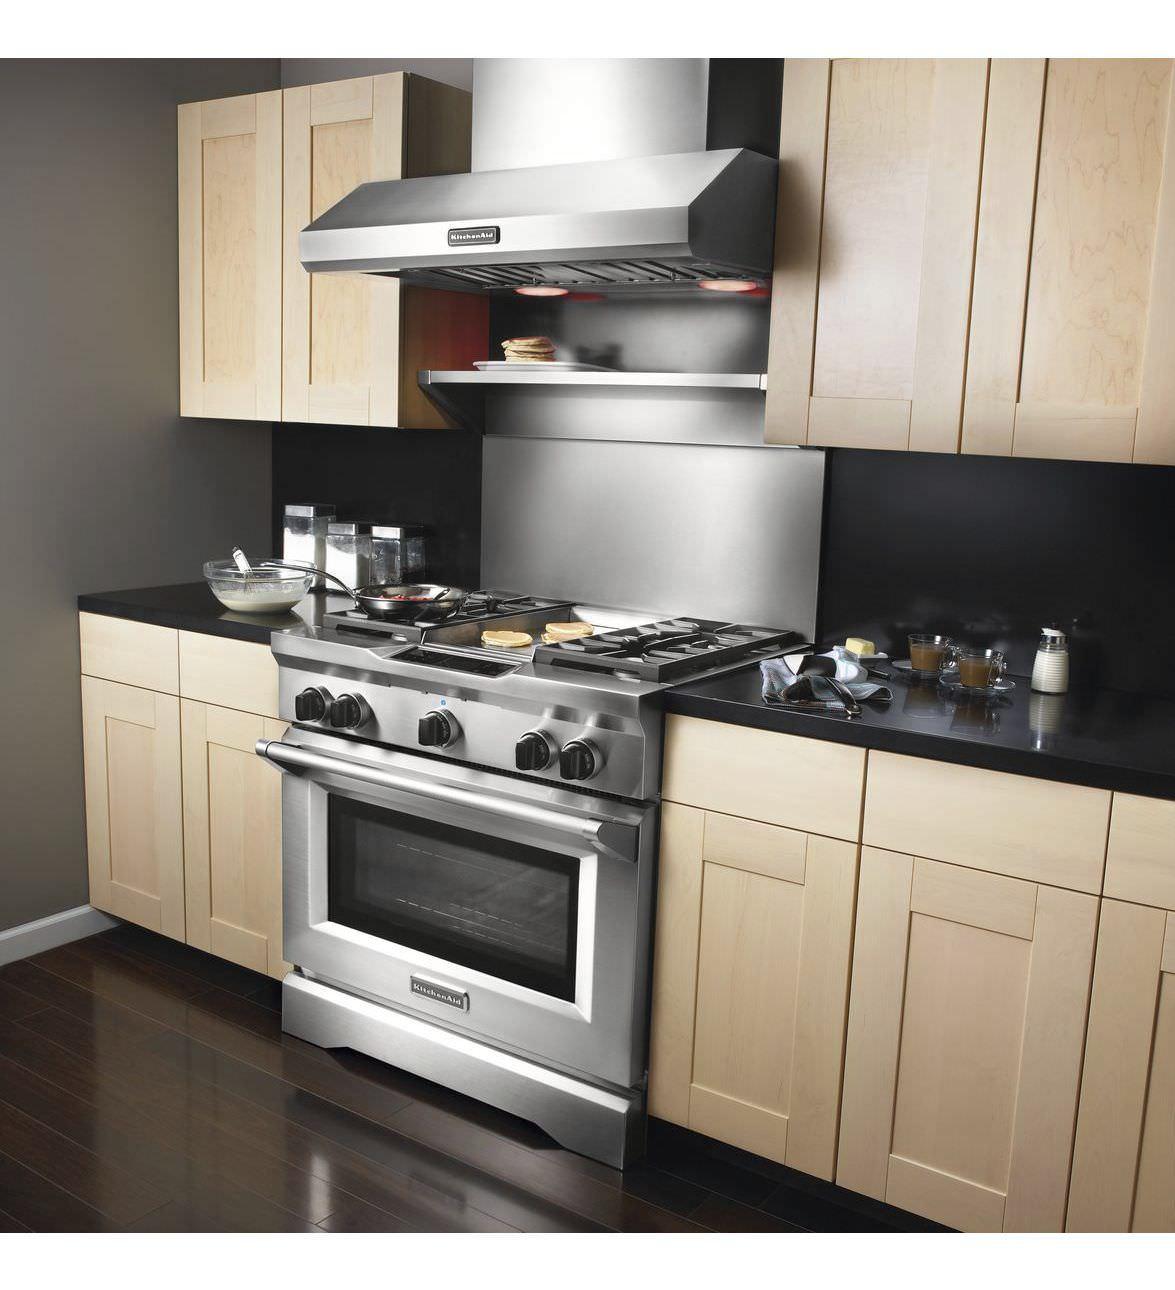 ... Gas Range Cooker / Electric / Dual Fuel KDRU763VSS KitchenAid